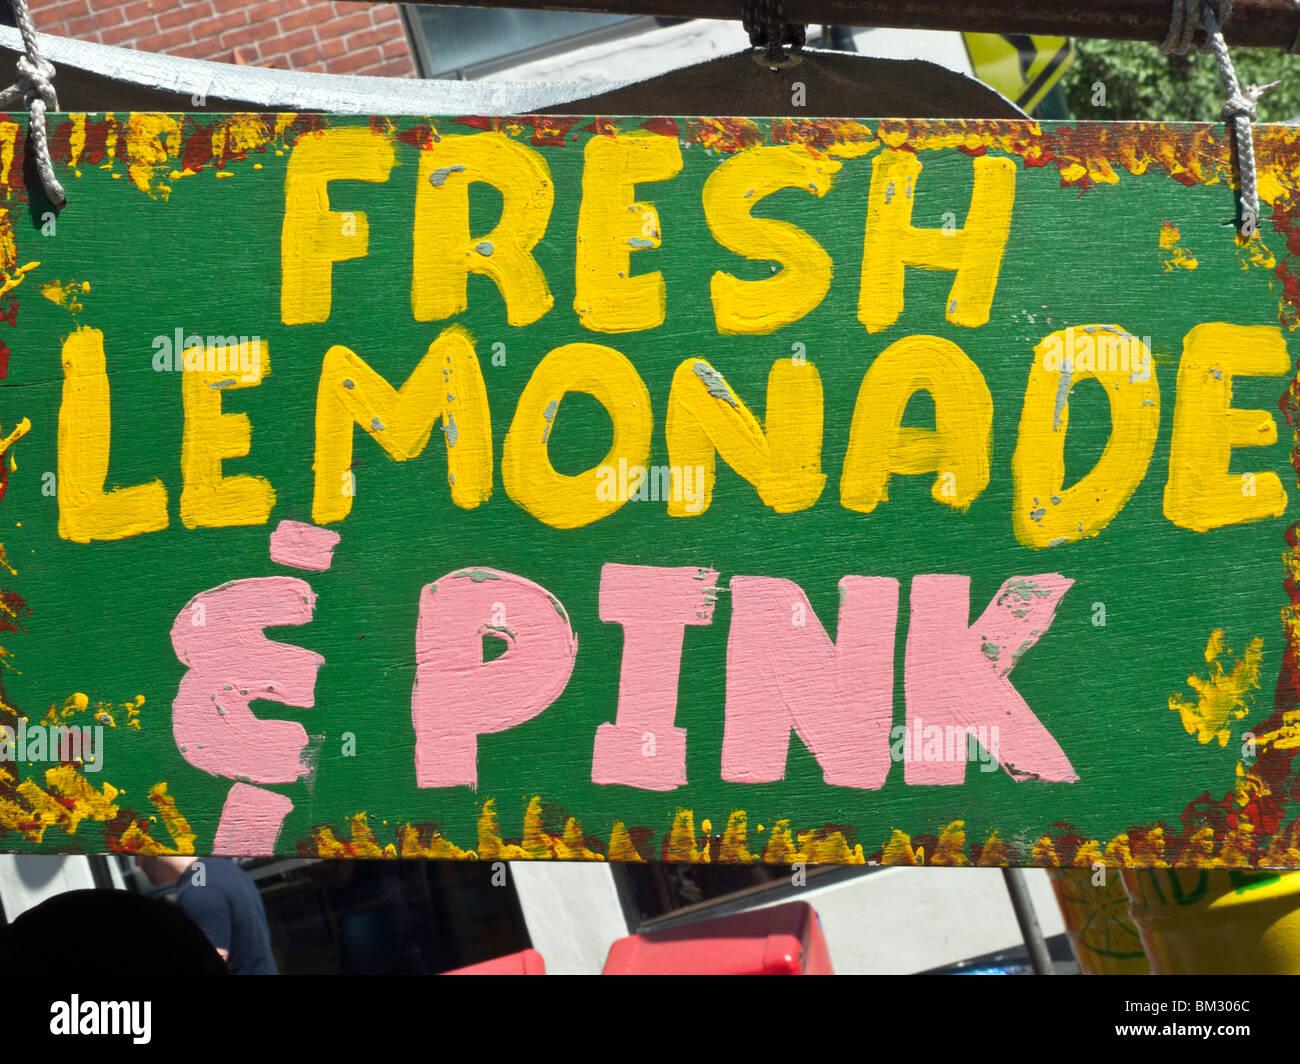 lemonade sign stock photos lemonade sign stock images alamy